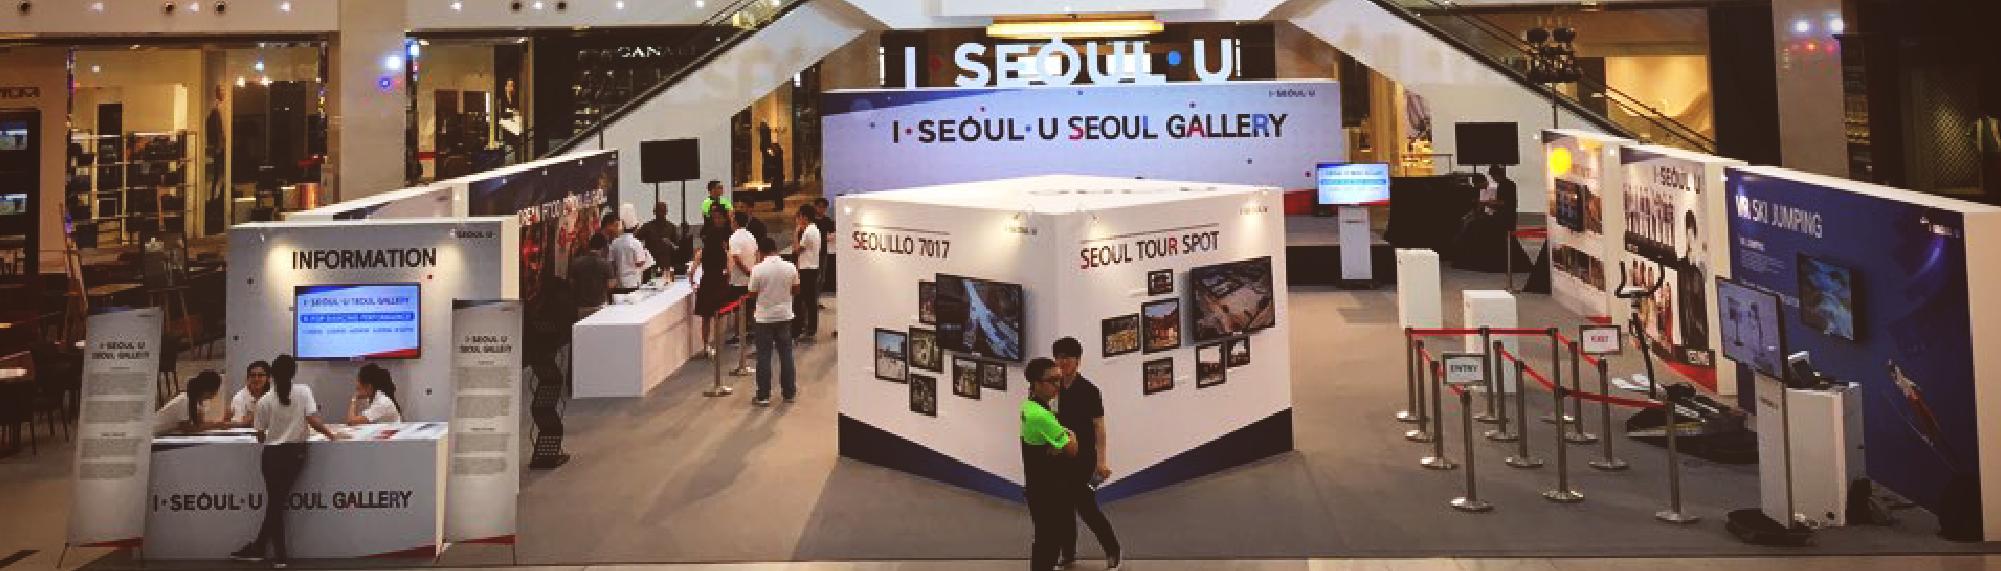 I Seoul U Seoul Gallery in Malaysia